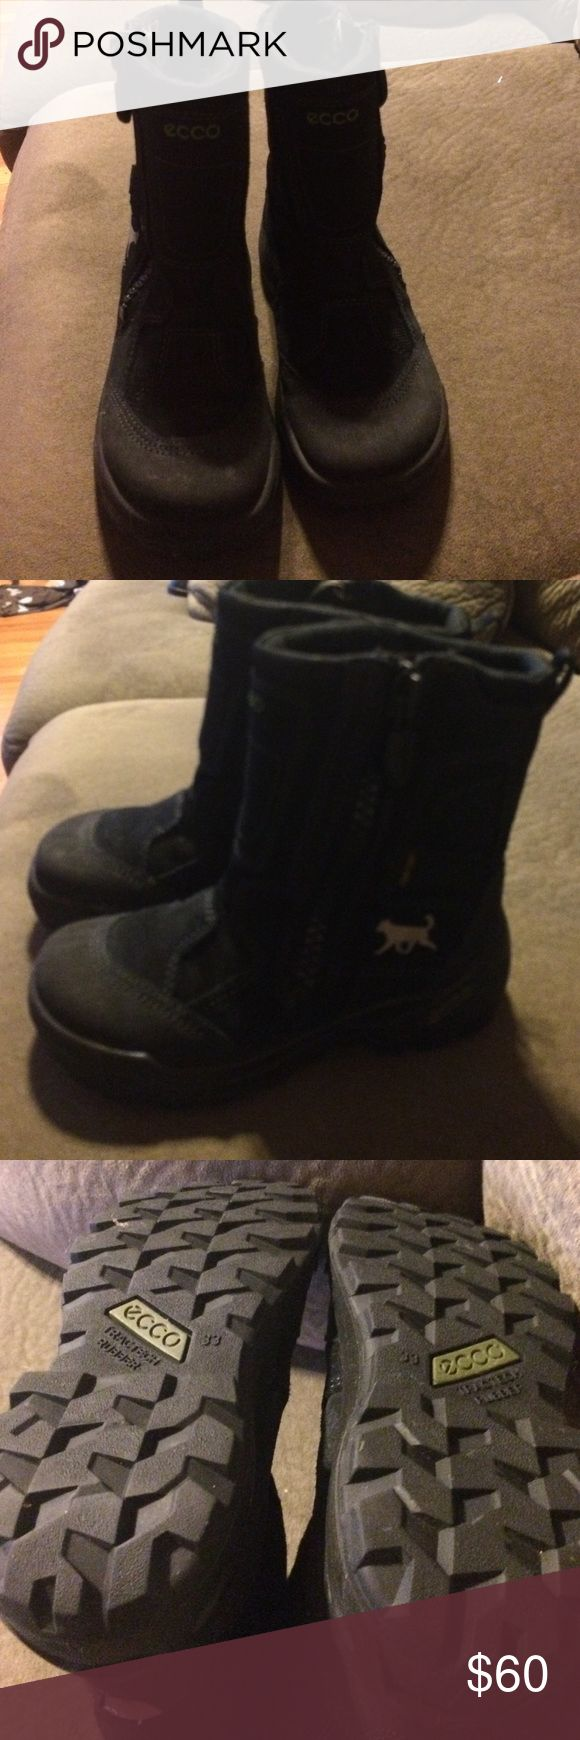 Ecco Boys Snowboots.  EUC.  Euro size 33/US size 1 Almost new Ecco Snowboots.  Side zipper.  Gore-Tex.  Great quality. Ecco Shoes Rain & Snow Boots